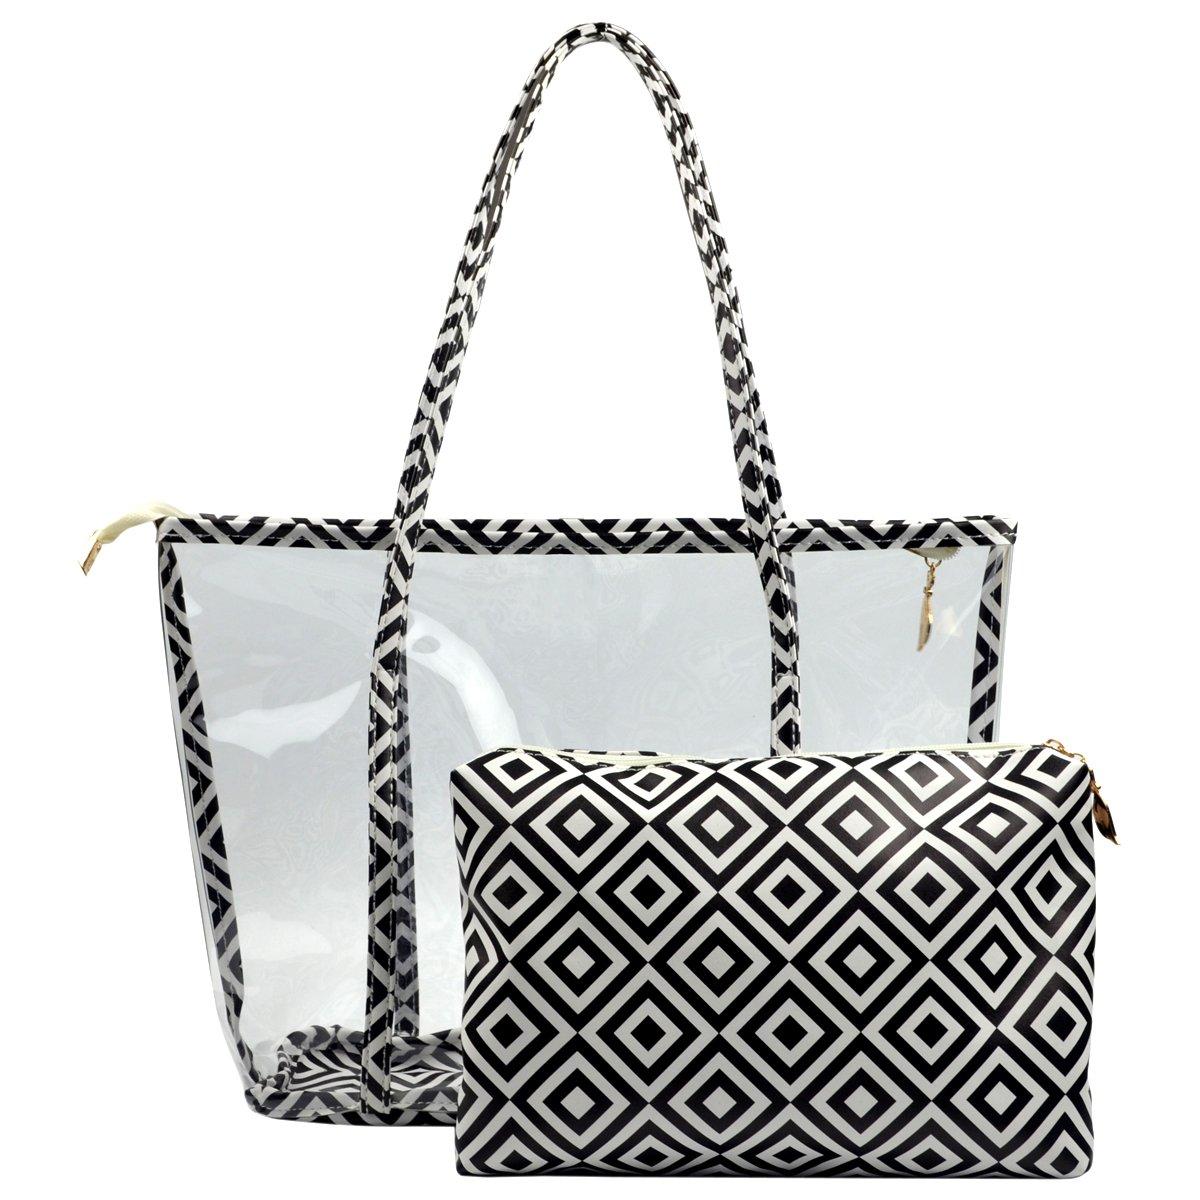 Clear Purse PVC Transparent Bag Work Handbags for Women Girls